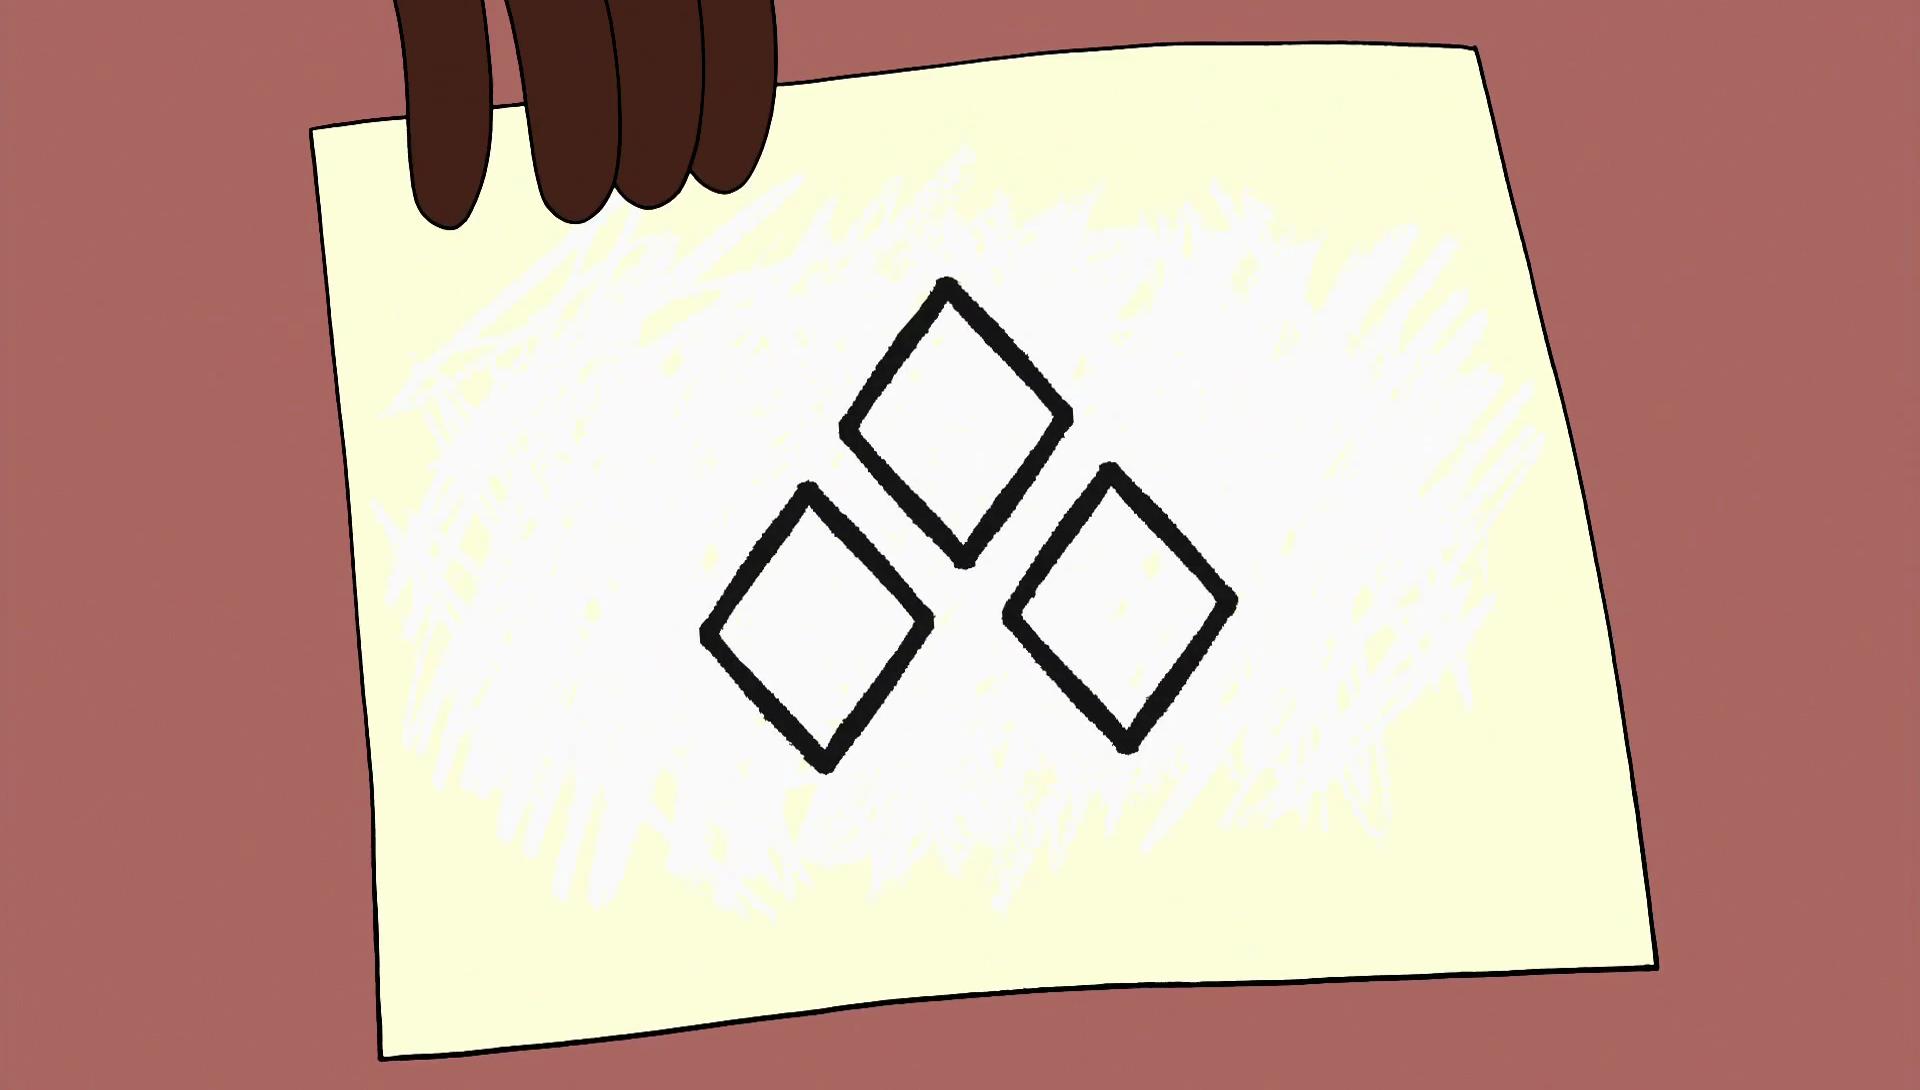 Steven universe gemkind wmg tv tropes centis drawing of the diamond symbol biocorpaavc Gallery